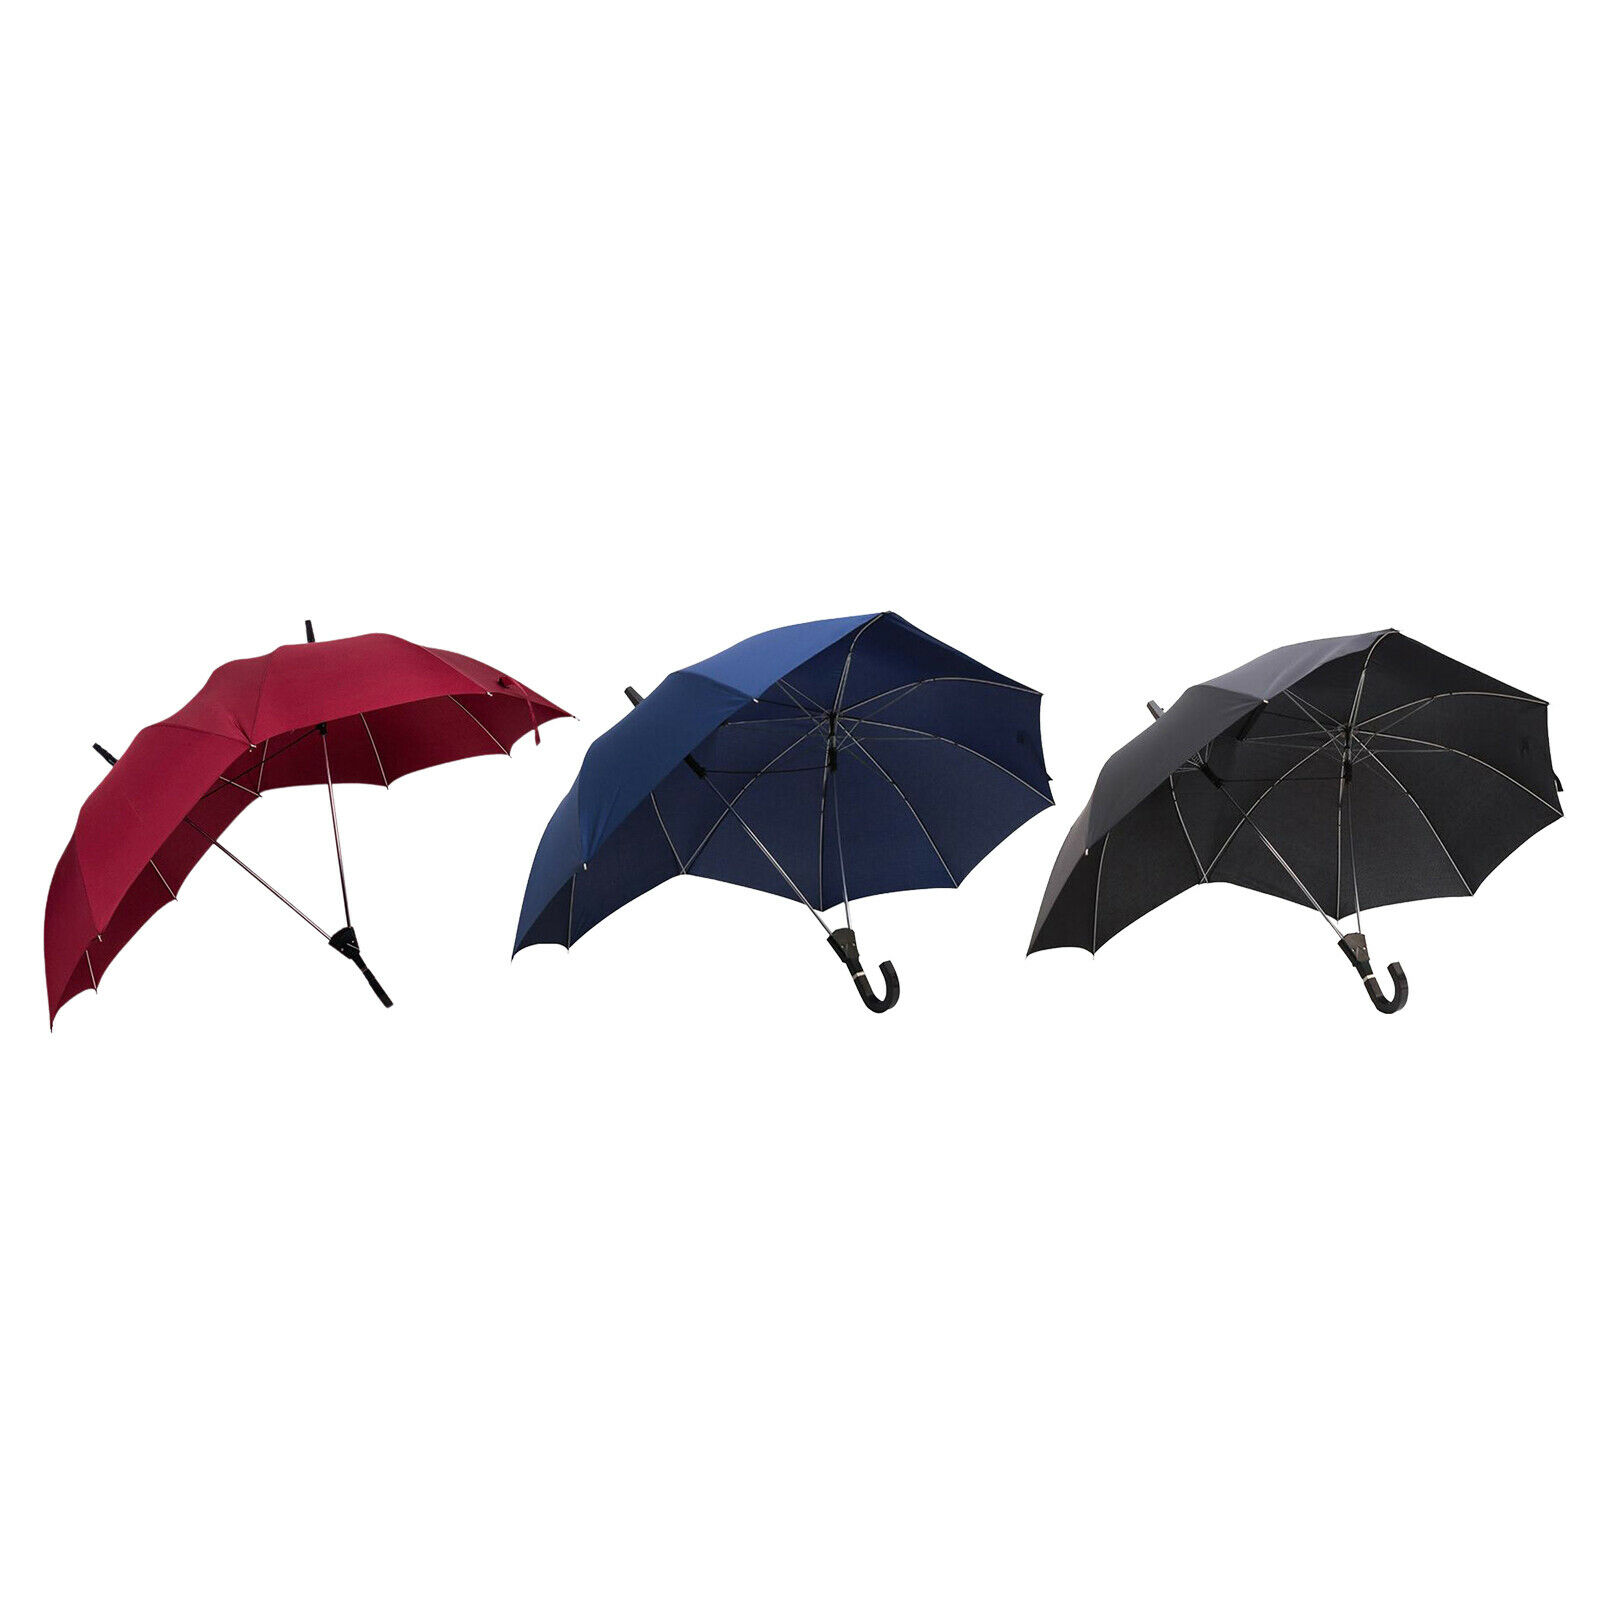 Novelty Windproof Umbrella Anti-UV Sun Rain Two-People Couple's Travel Parasol